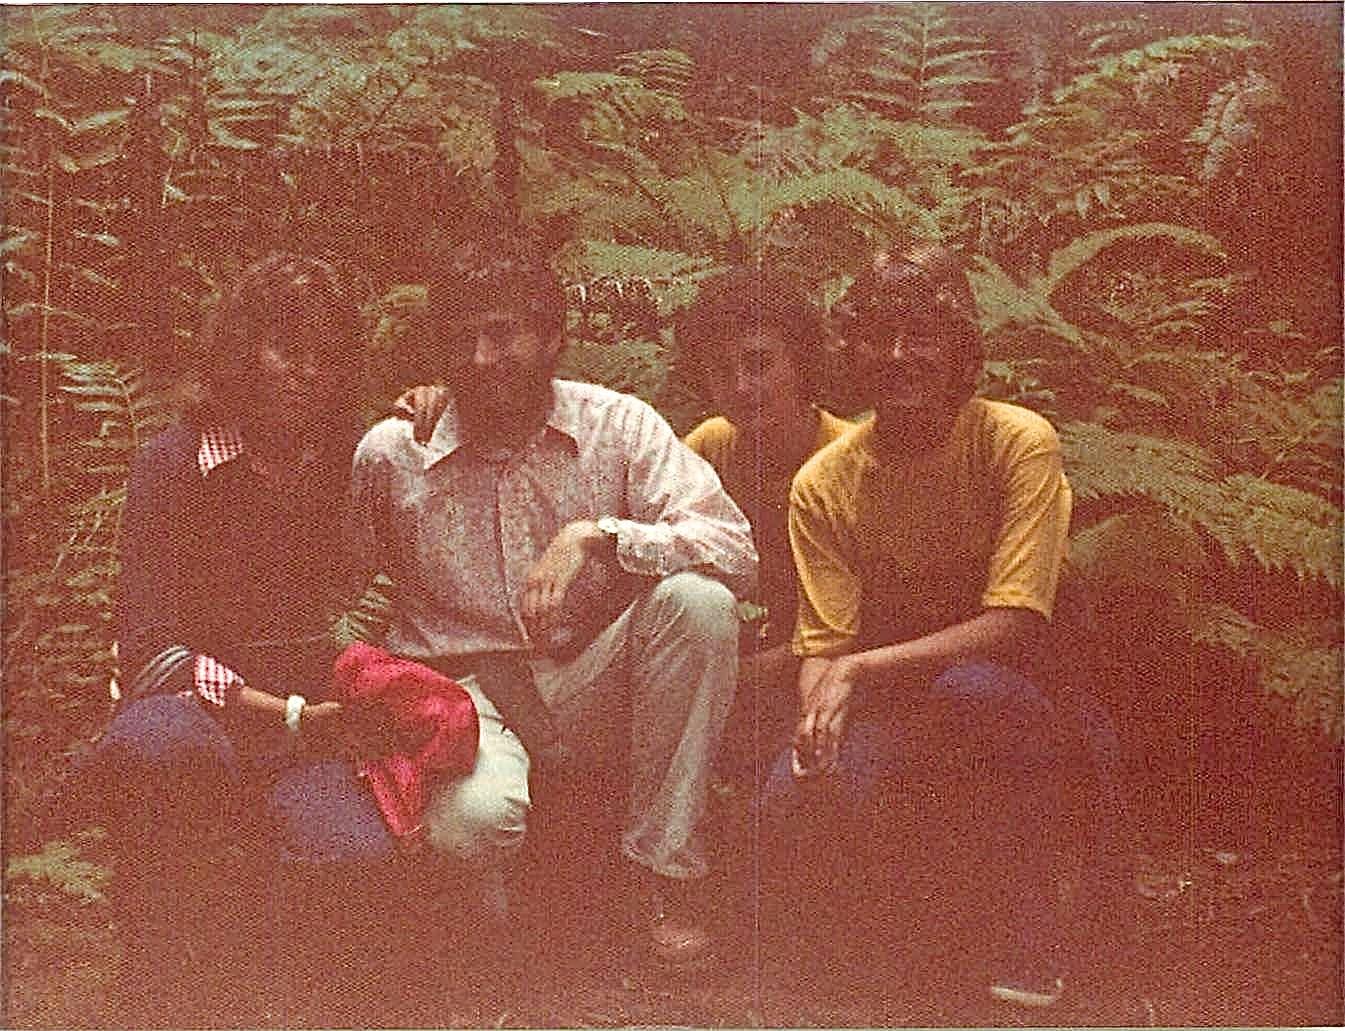 Aug. 1975, Muir Woods, CA  Celeste, John, Ann & Cindy Wagner